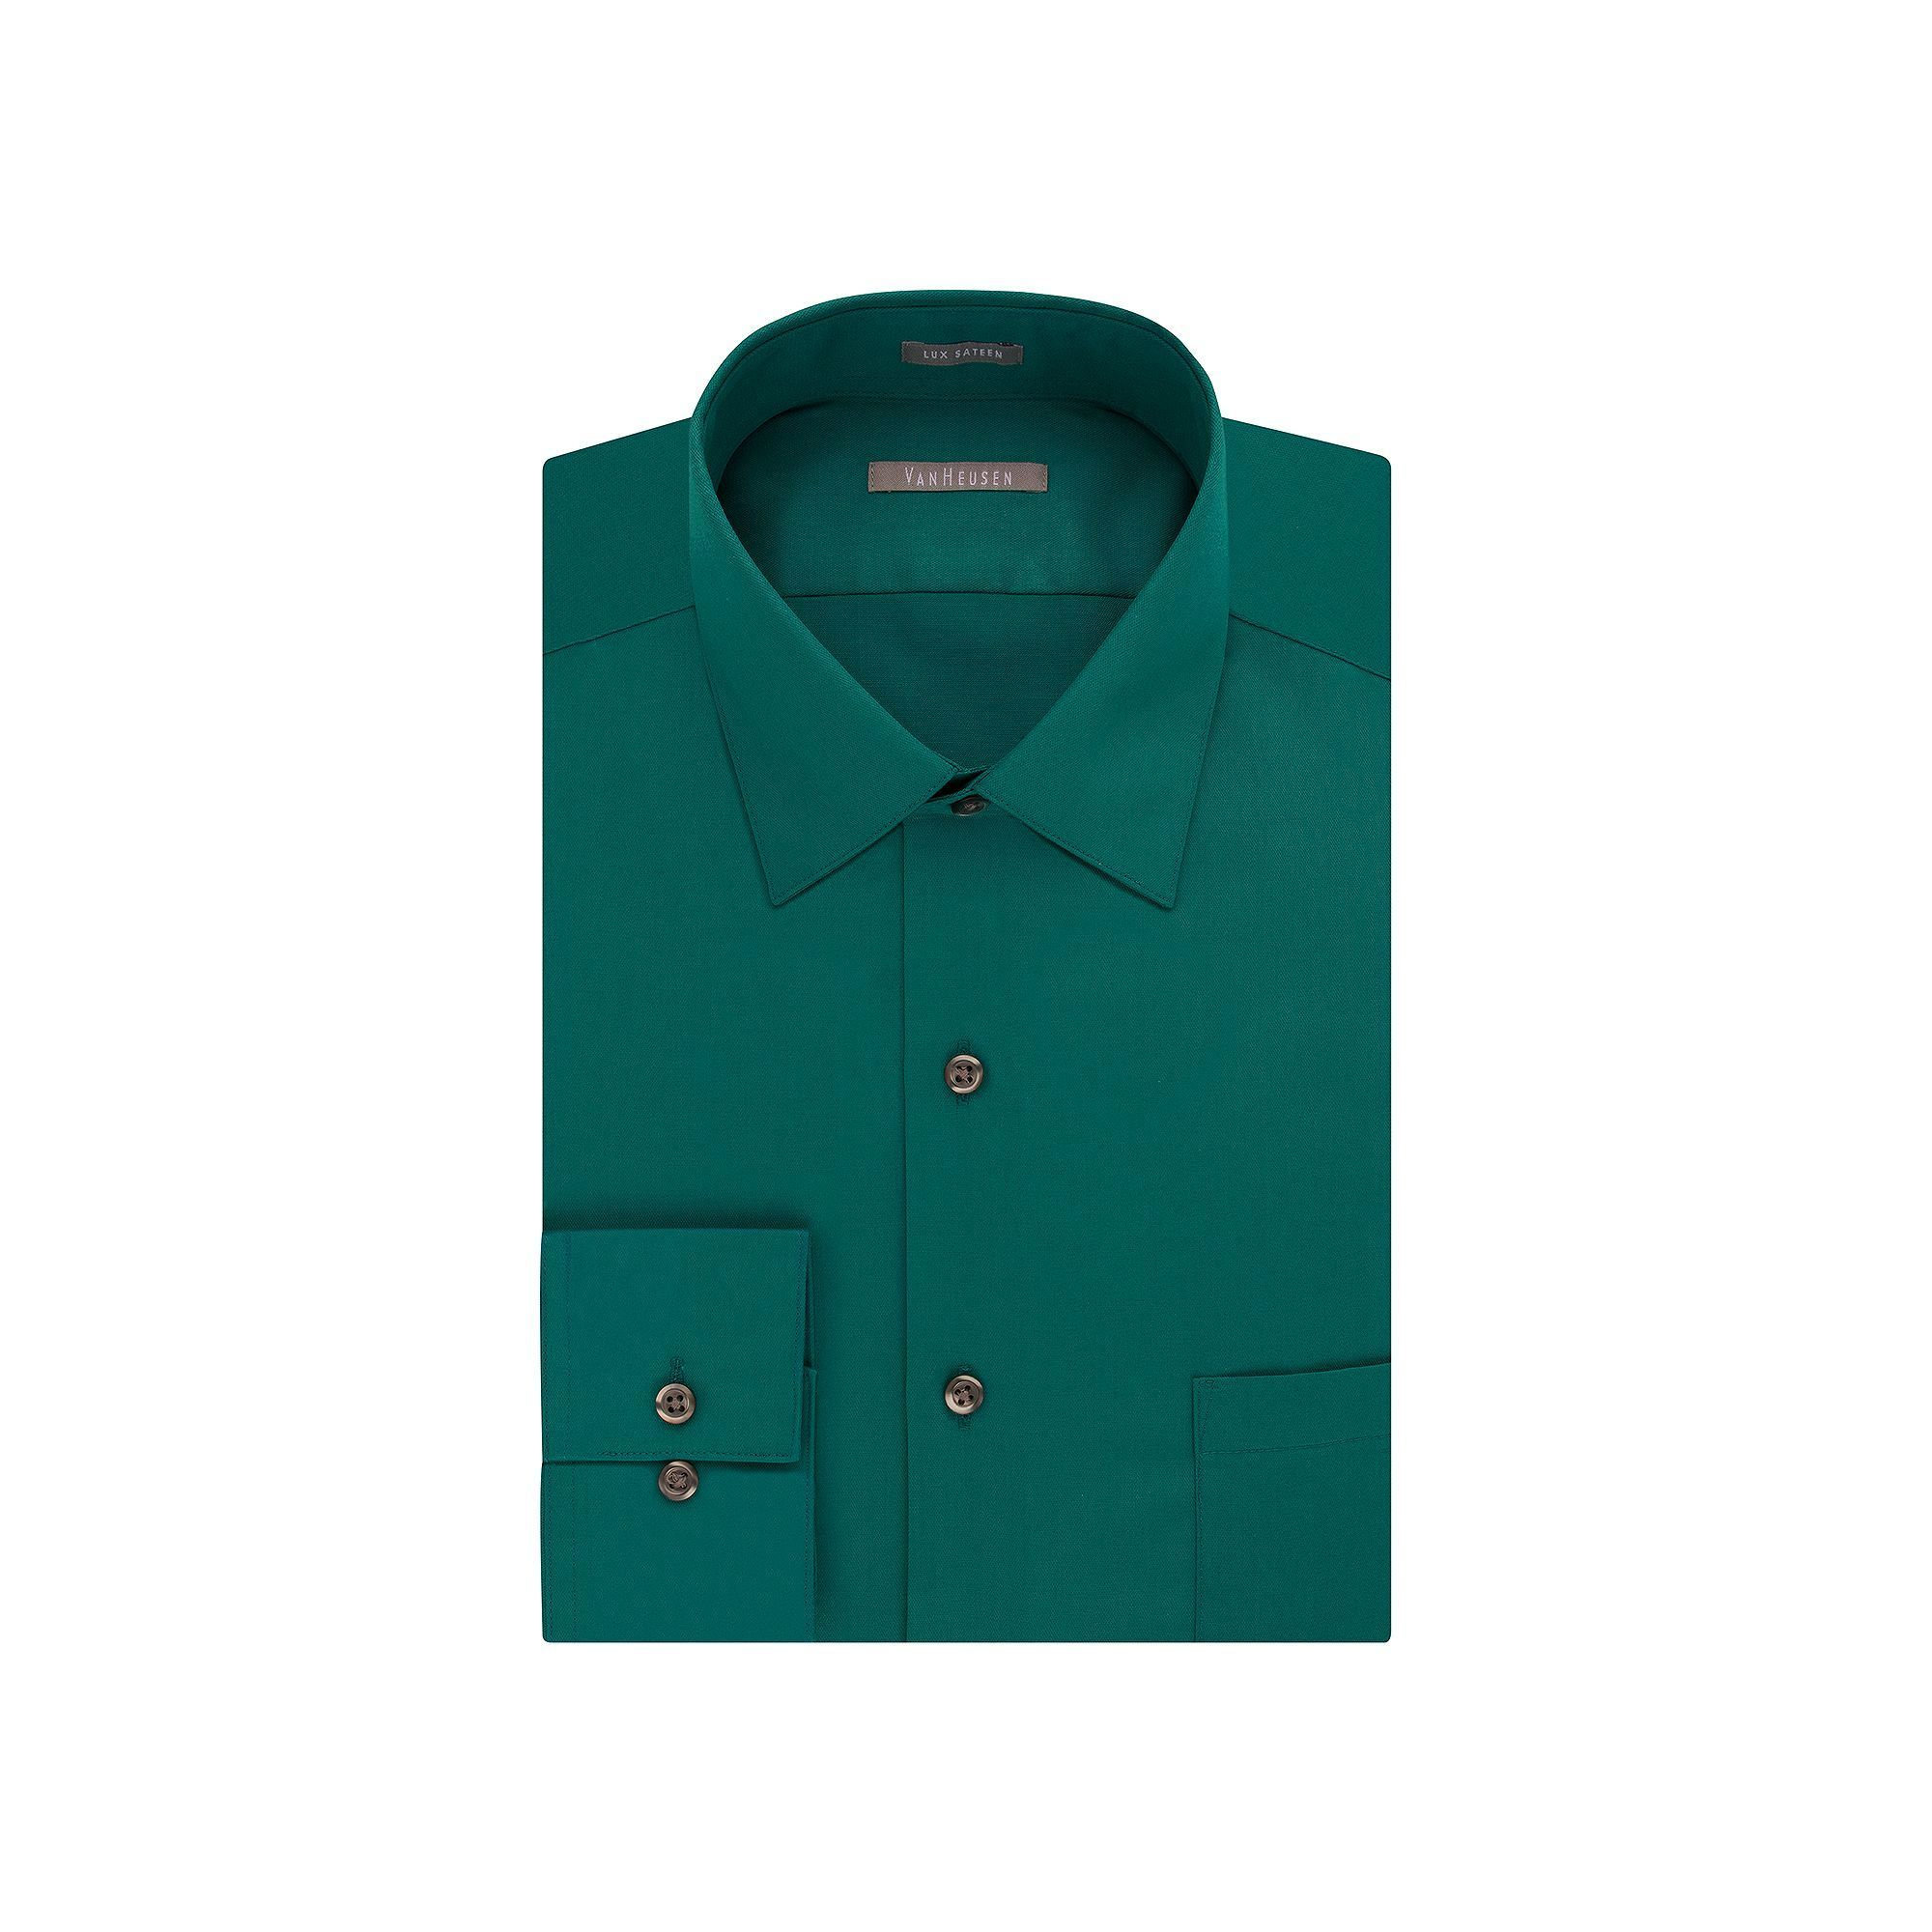 Green dress shirt mens Van Heusen Big u Tall RegularFit Solid Lux Sateen NoIron Spread